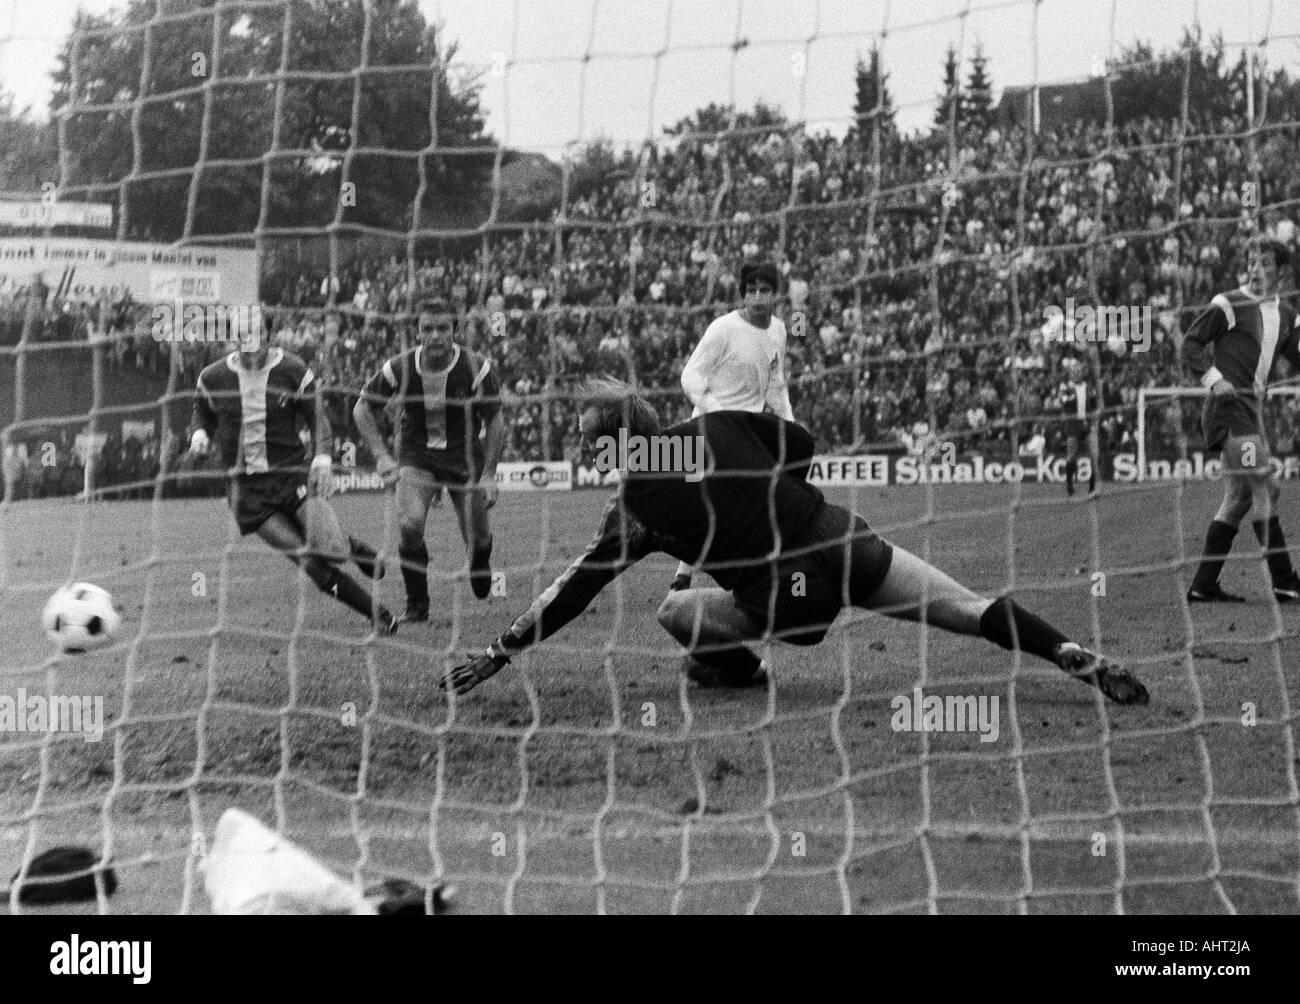 football, Bundesliga, 1970/1971, Boekelberg Stadium, Borussia Moenchengladbach versus 1. FC Cologne 1:1, scene of the match, f.l.t.r. Horst Koeppel, Herbert Laumen (both MG), keeper Manfred Manglitz, Werner Biskup (both Koeln), Herbert Wimmer (MG) - Stock Image